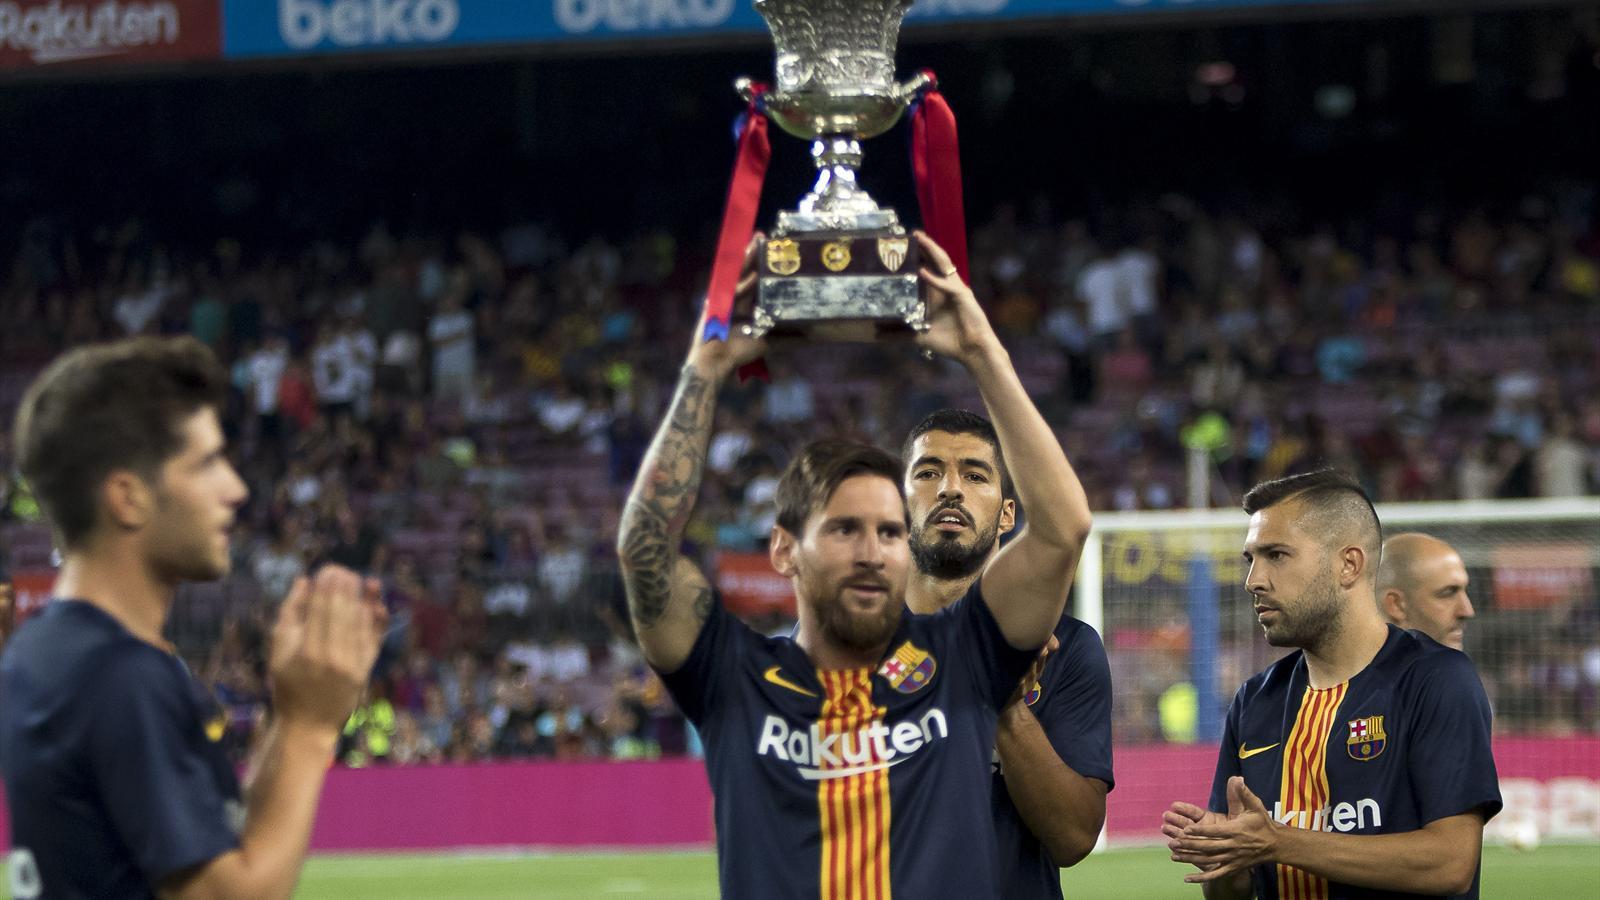 Финал суперкубок испании по футболу